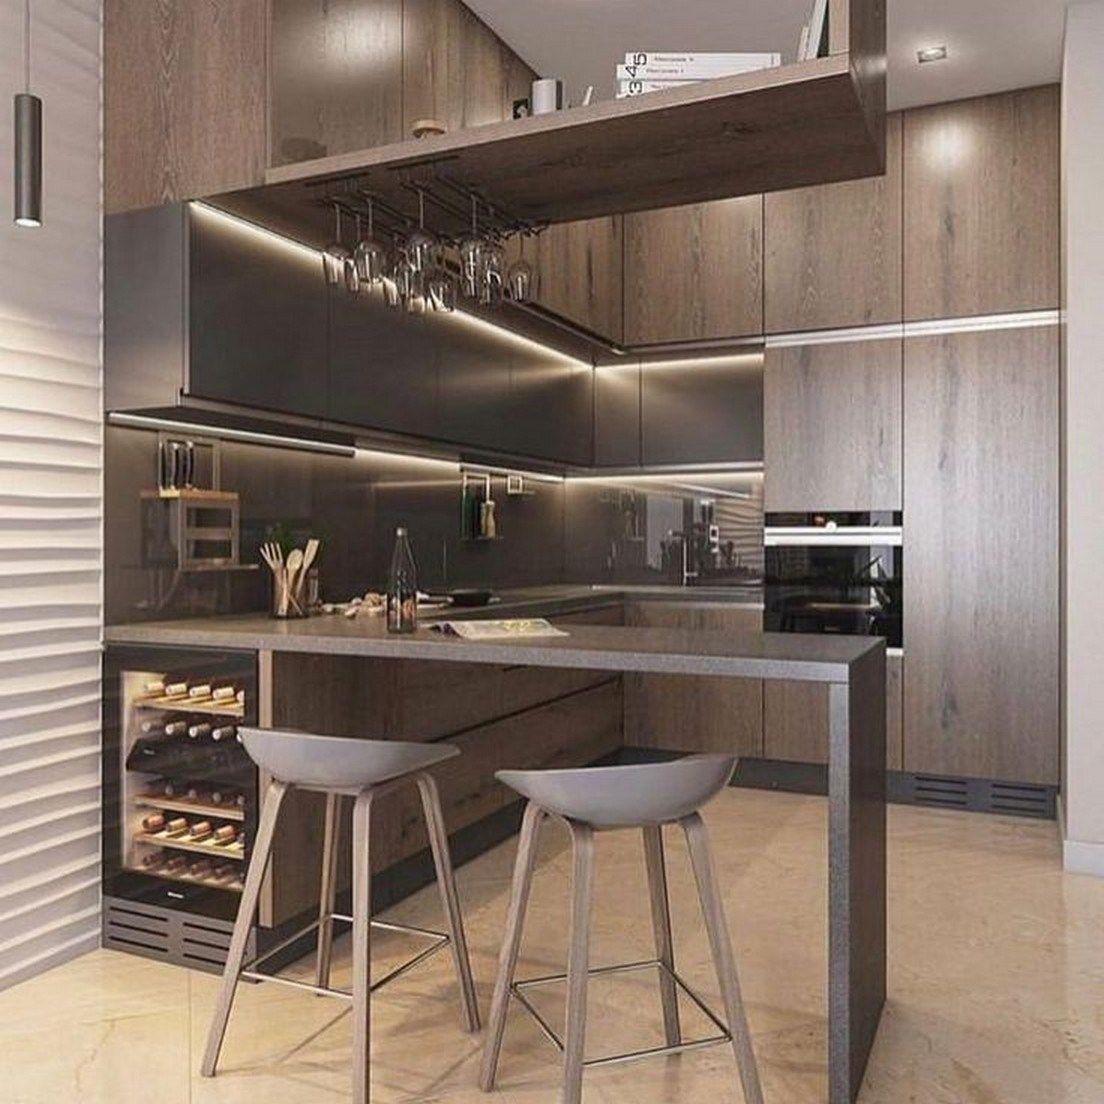 ✓ 9 amazing luxury kitchen ideas for your home 9 > Fieltro.Net